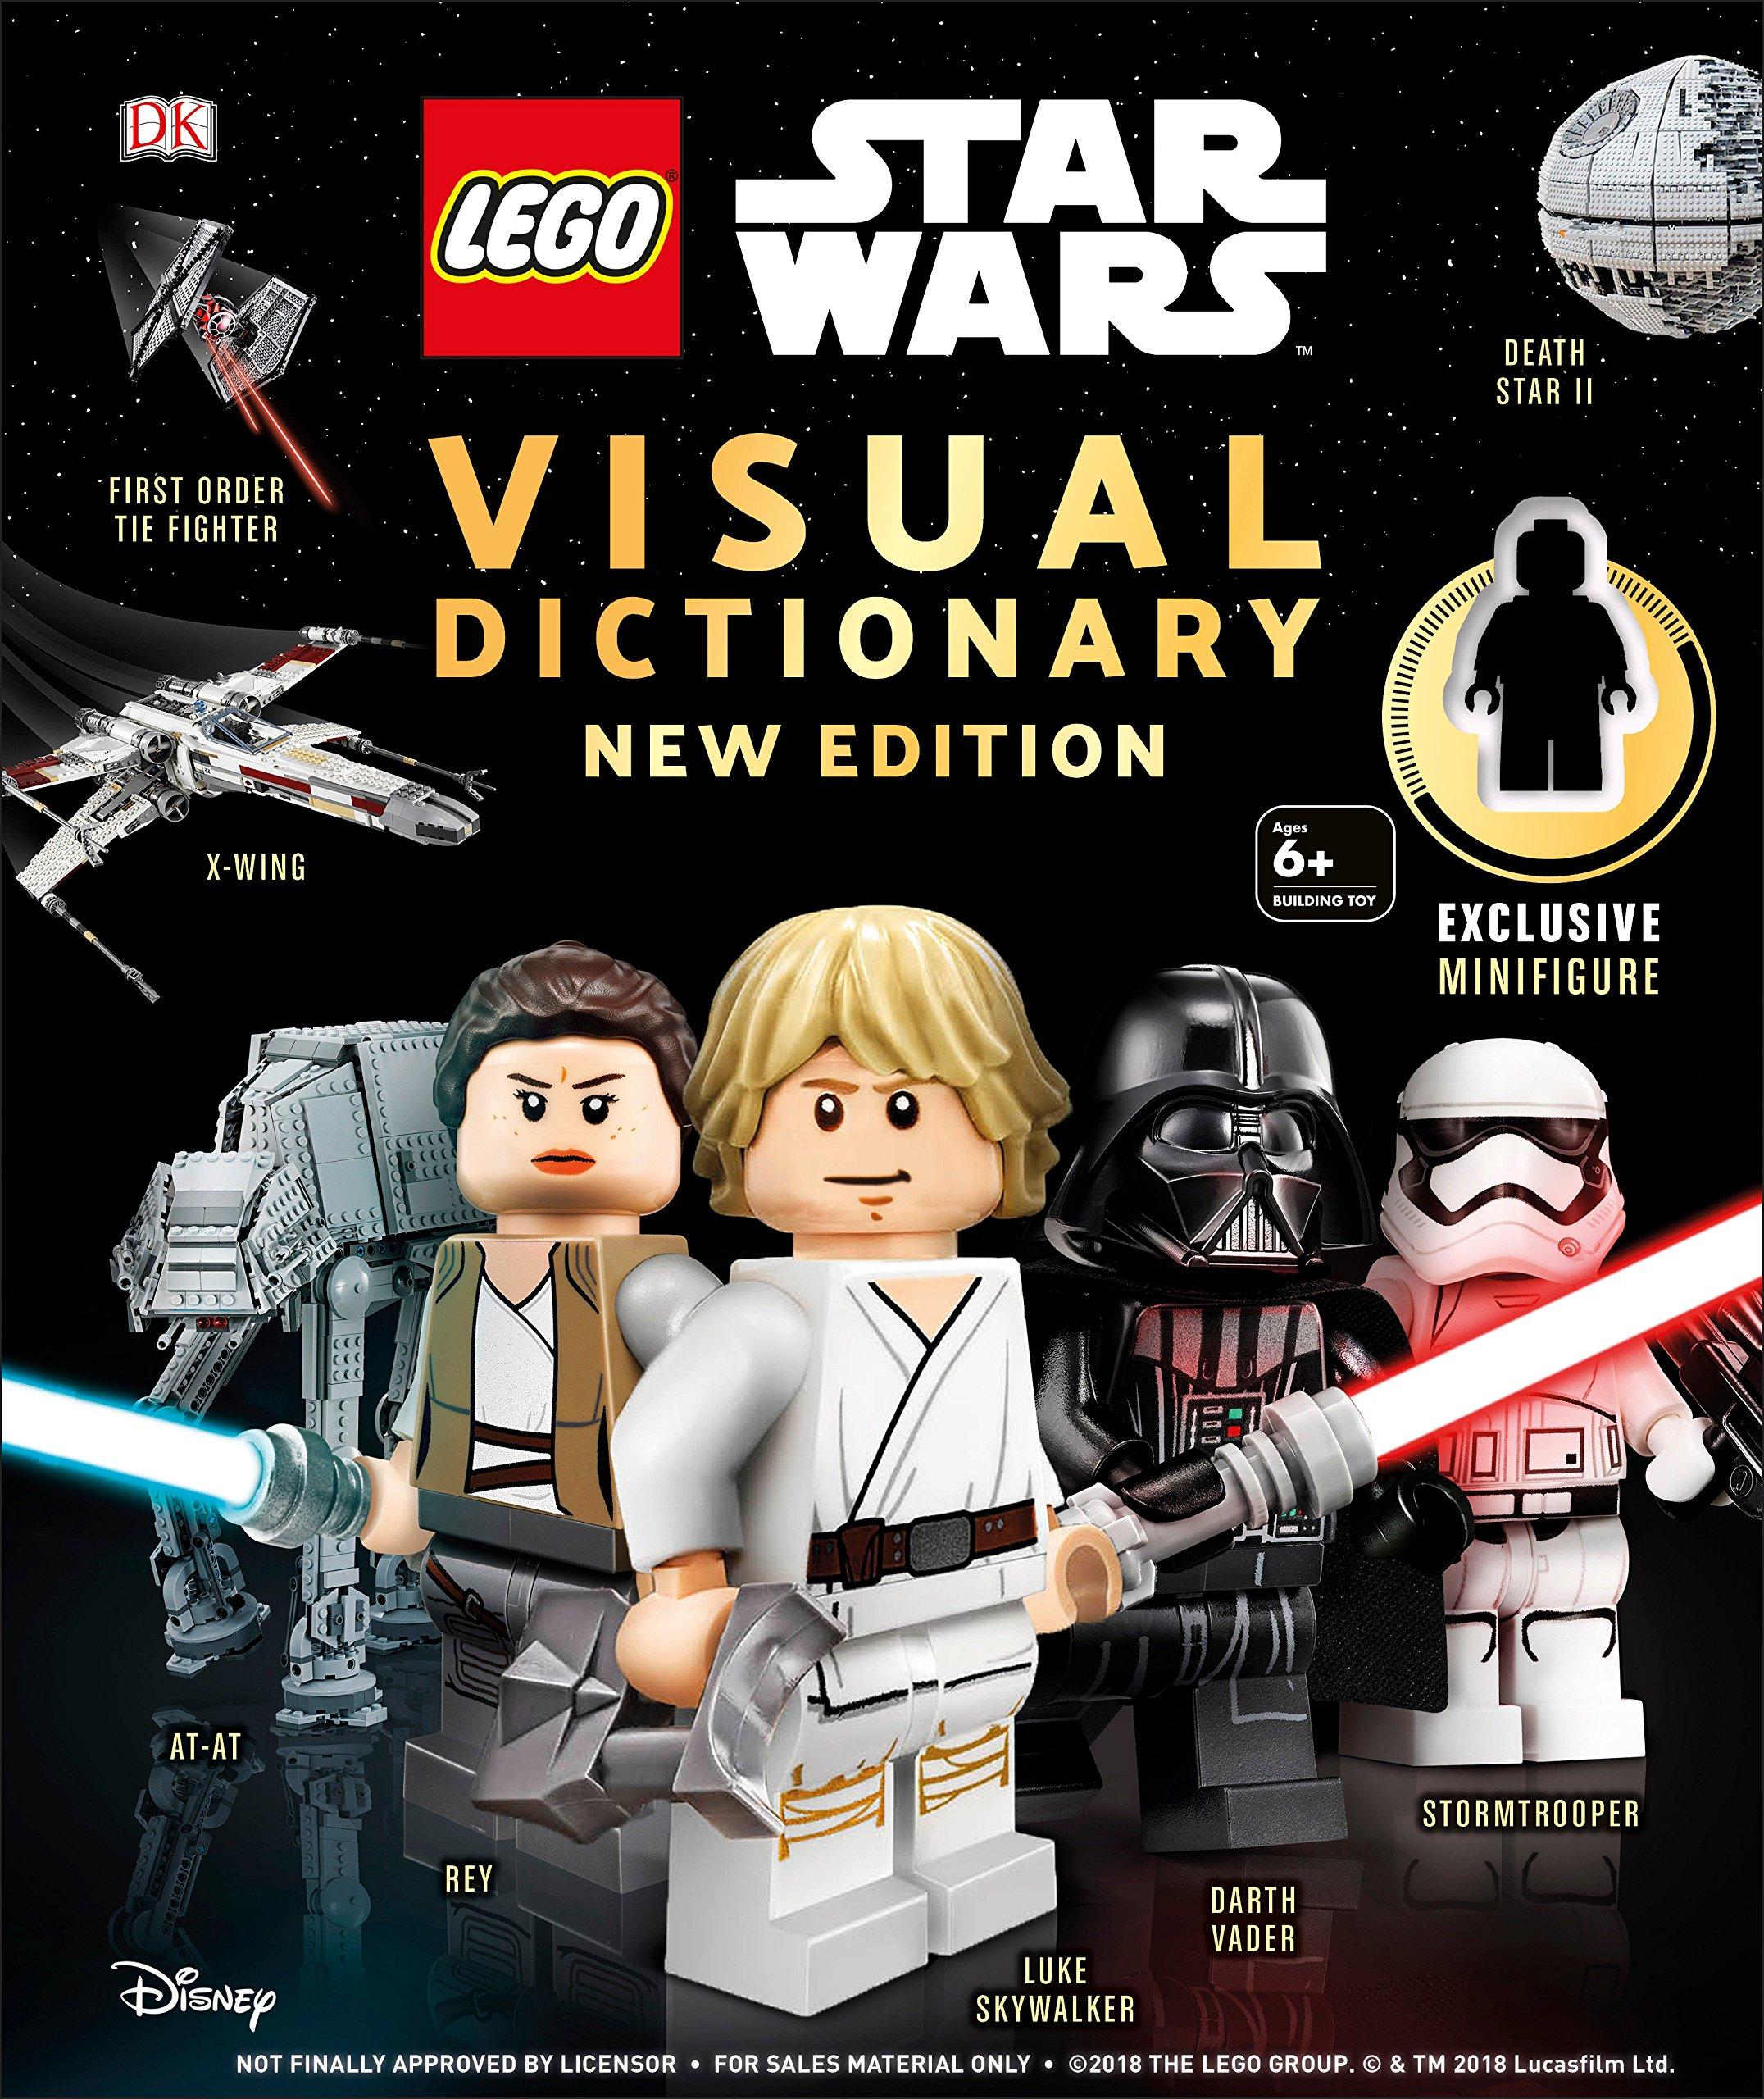 LEGO Star Wars Visual Dictionary New Edition Temp Cover.jpg